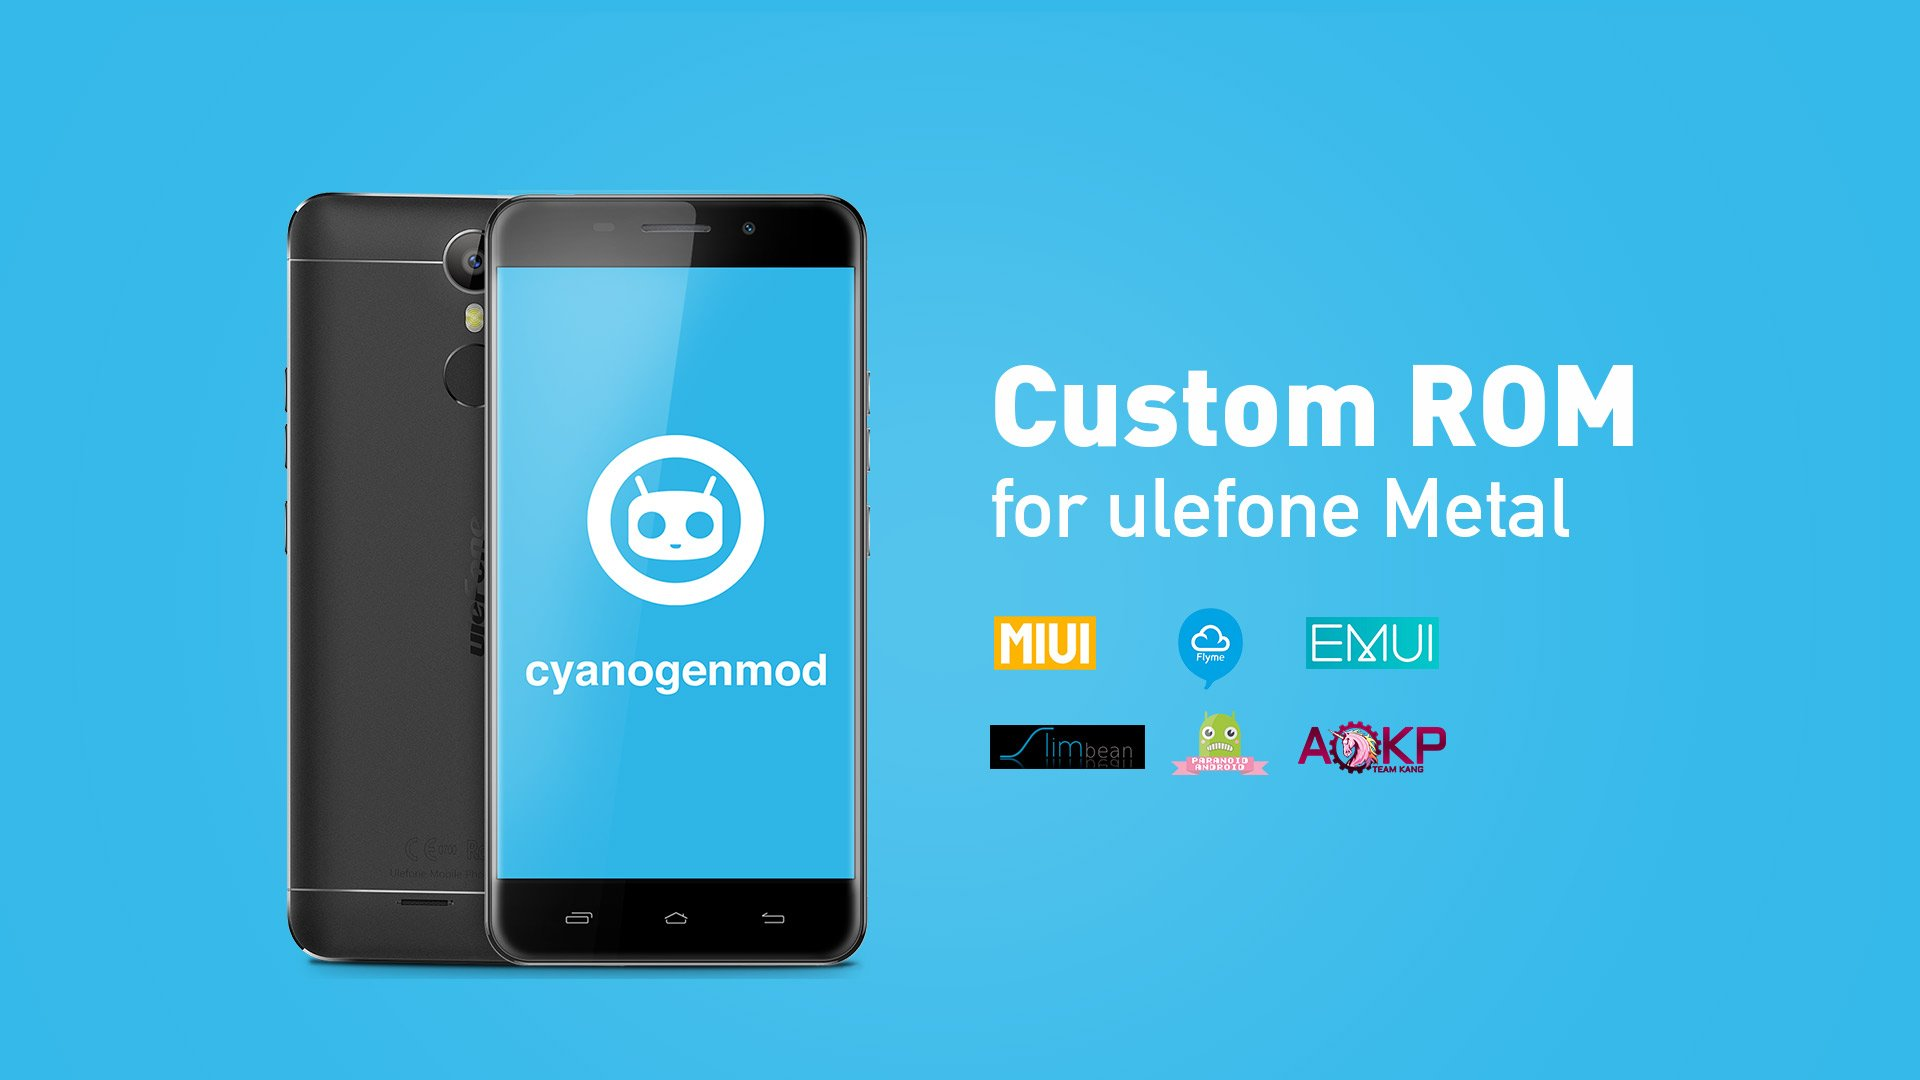 Ulefone Metal CyanogenMod custom rom